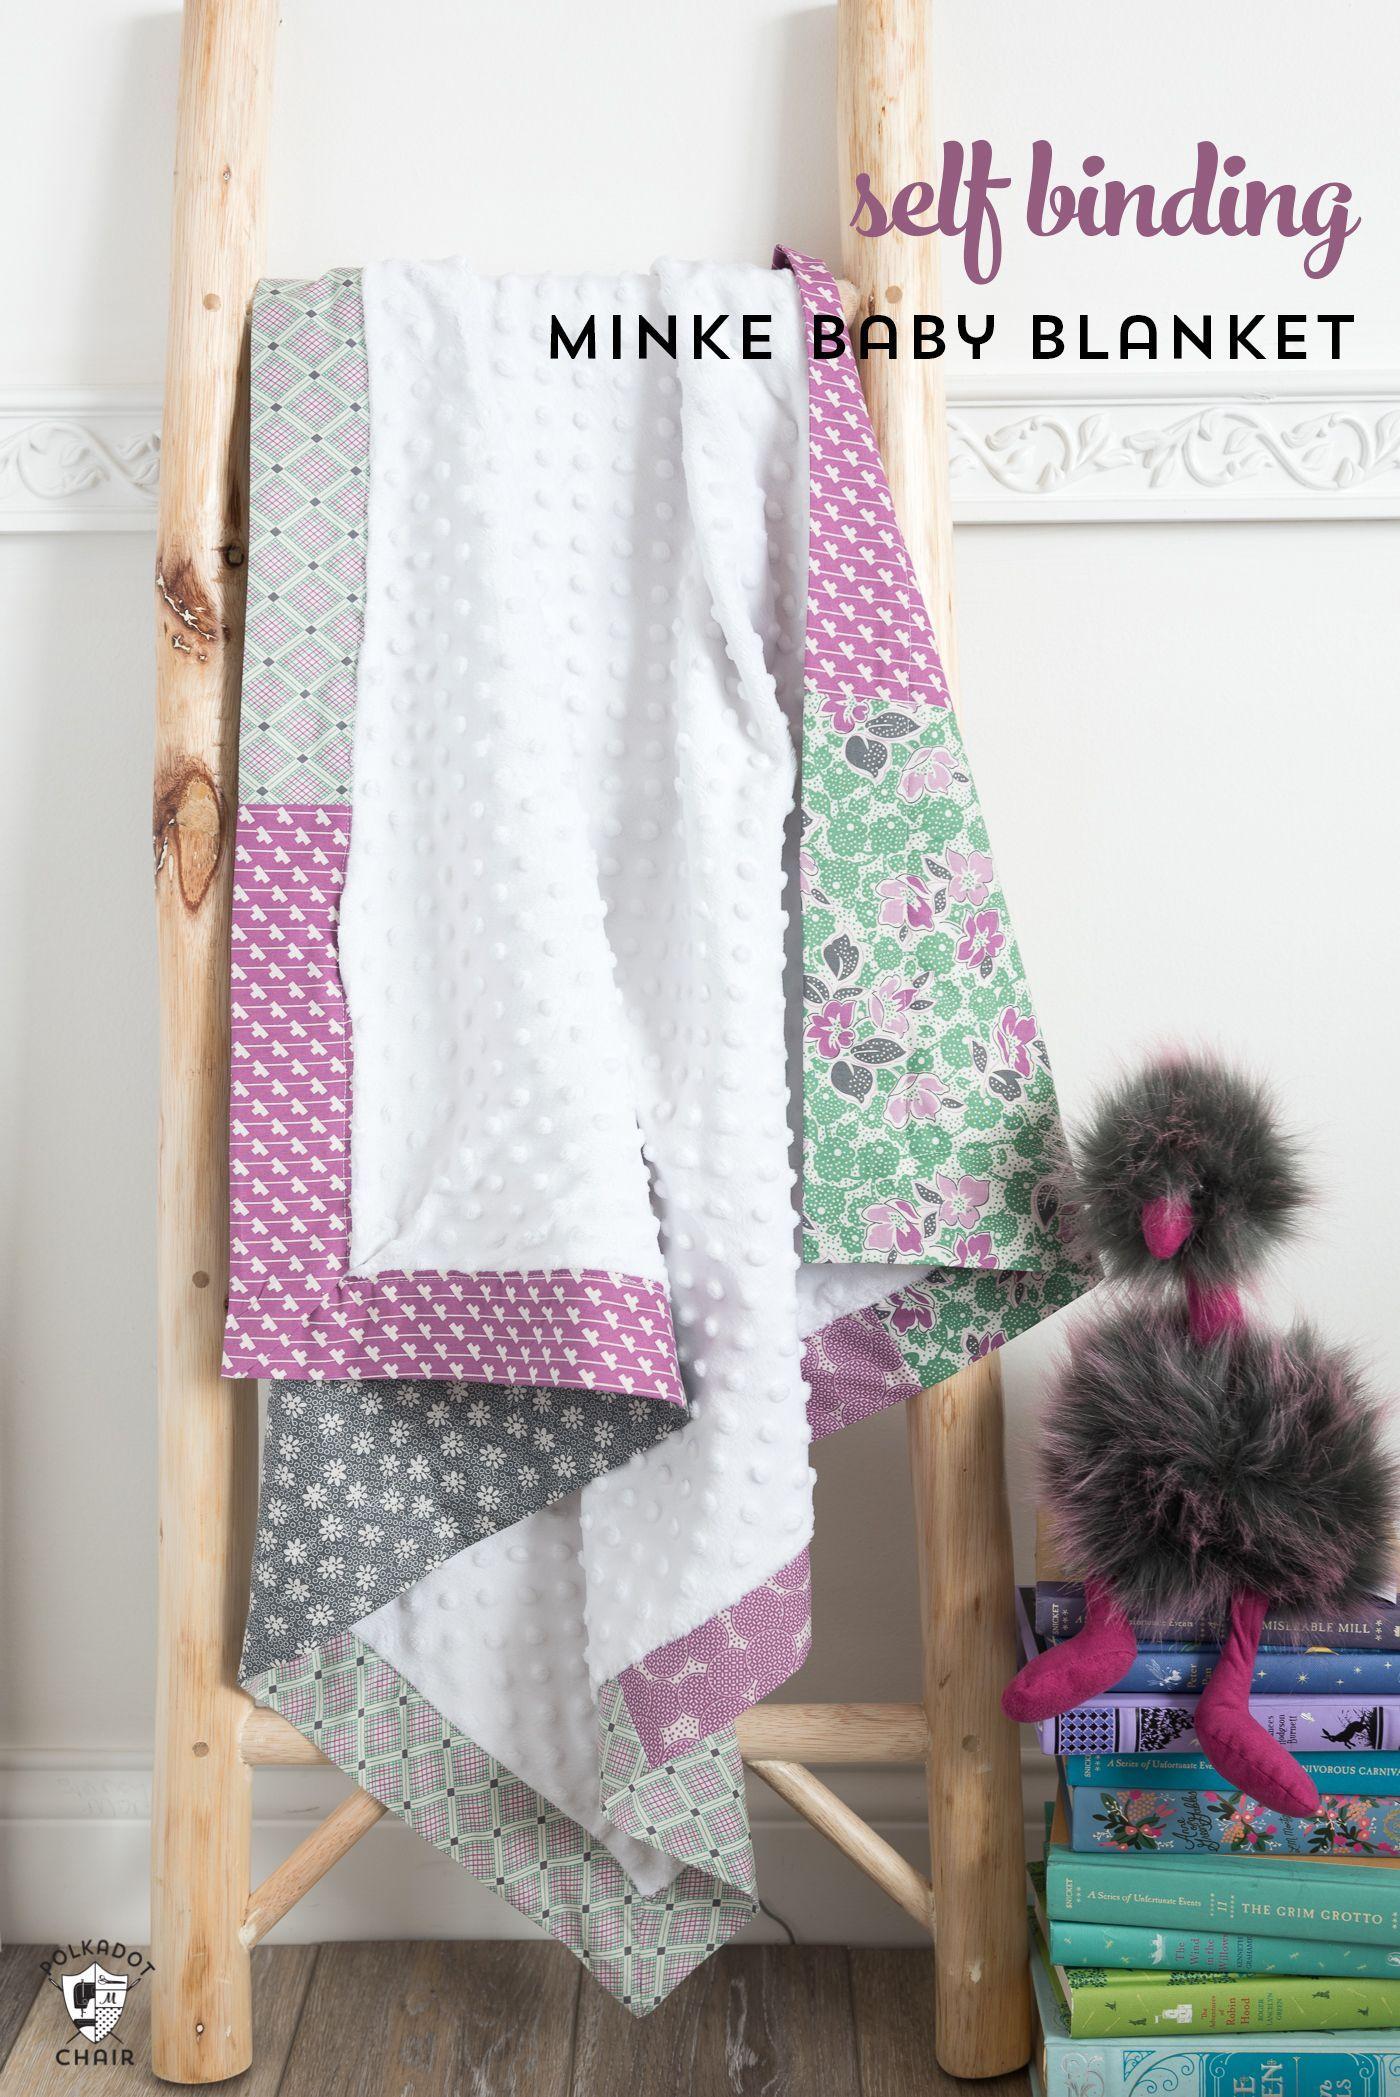 Self binding minke baby blanket tutorial via polkadotchair sewing